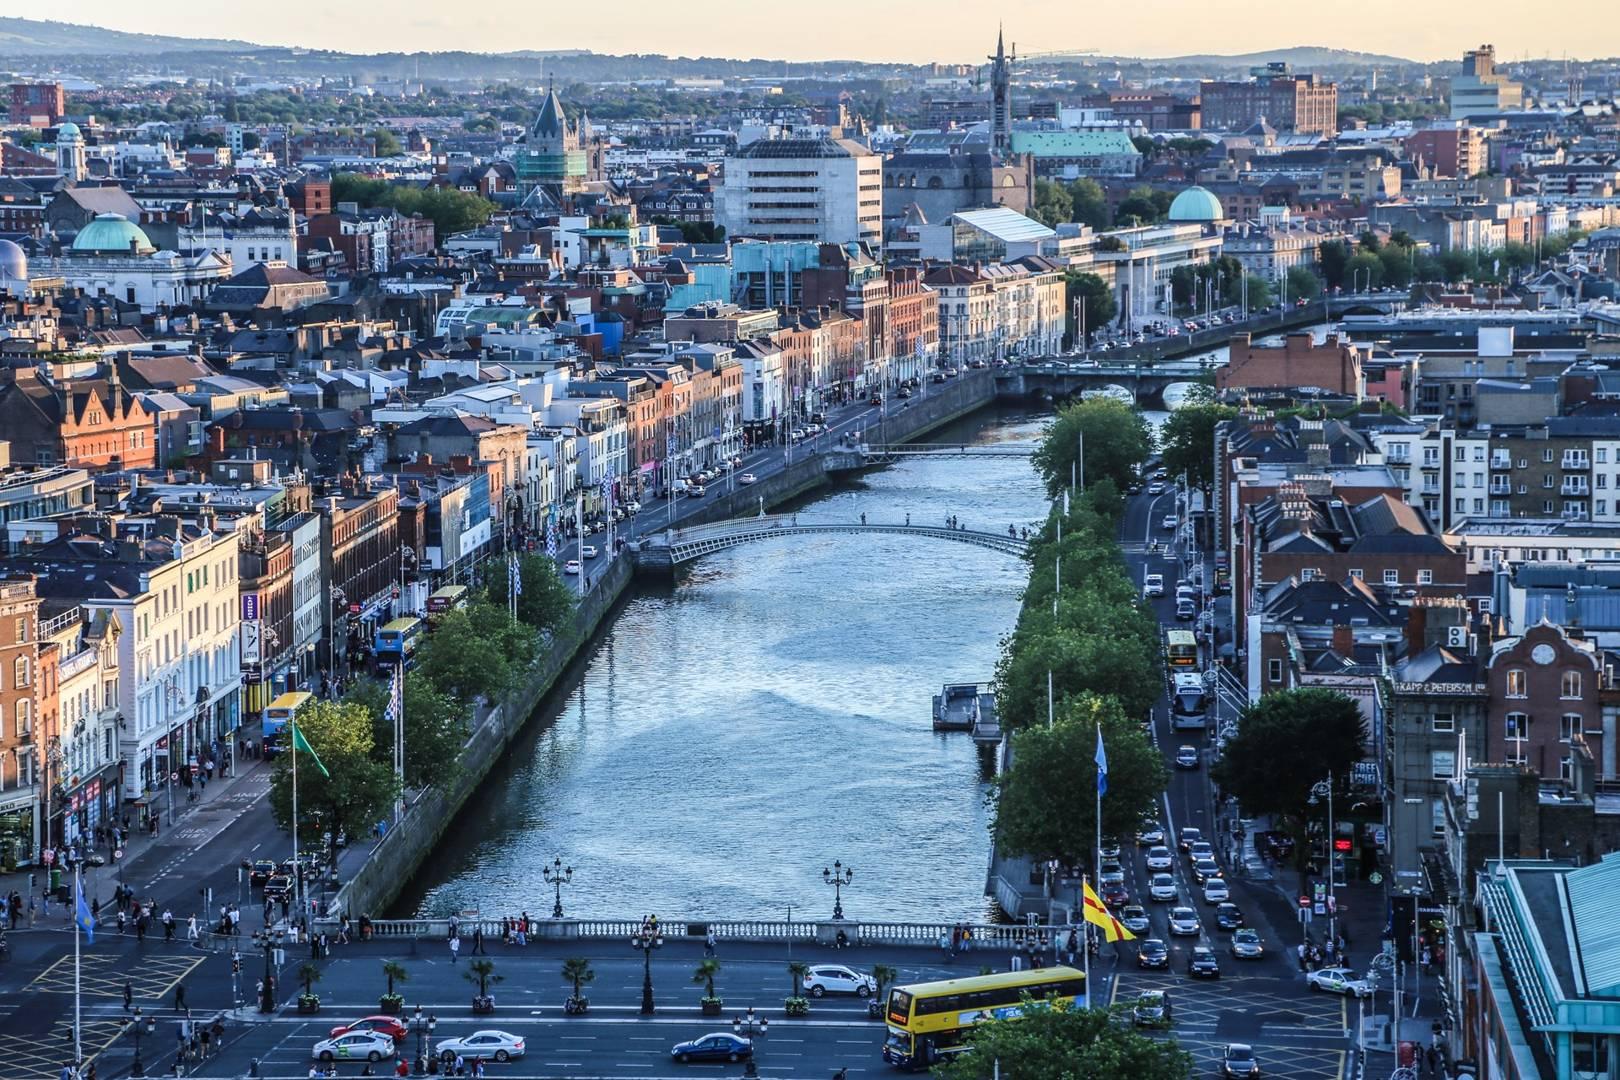 view-of-the-liffey-from-liberty-hall-dublin-ireland-conde-nast-traveller-4feb16-Tara-Morgan